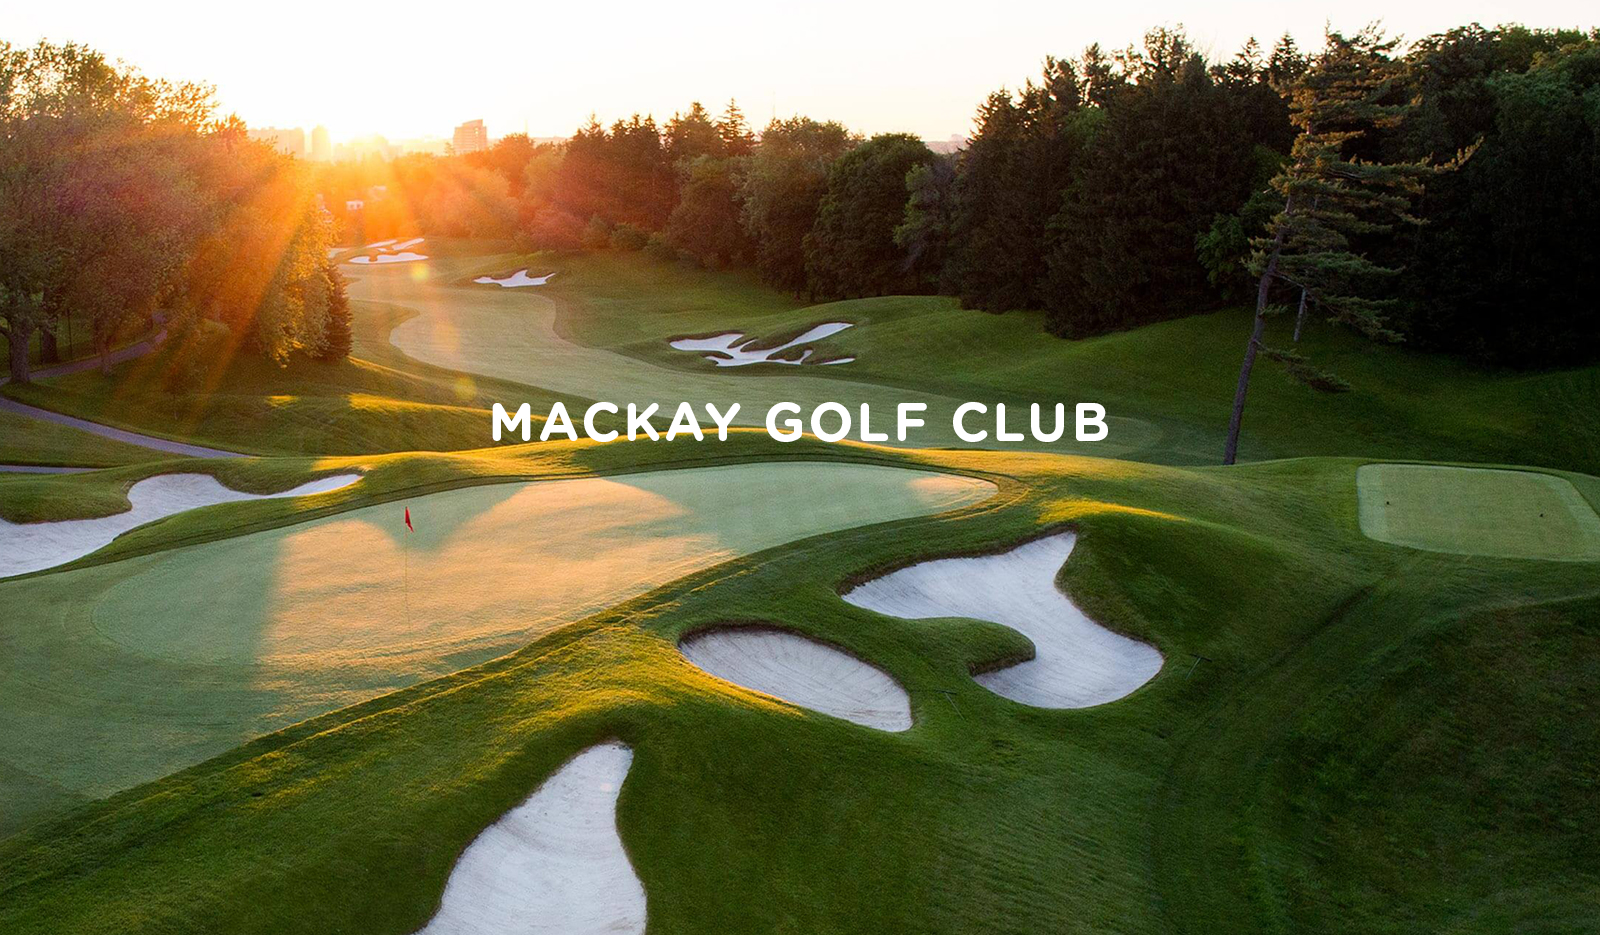 ref_mackay_golf